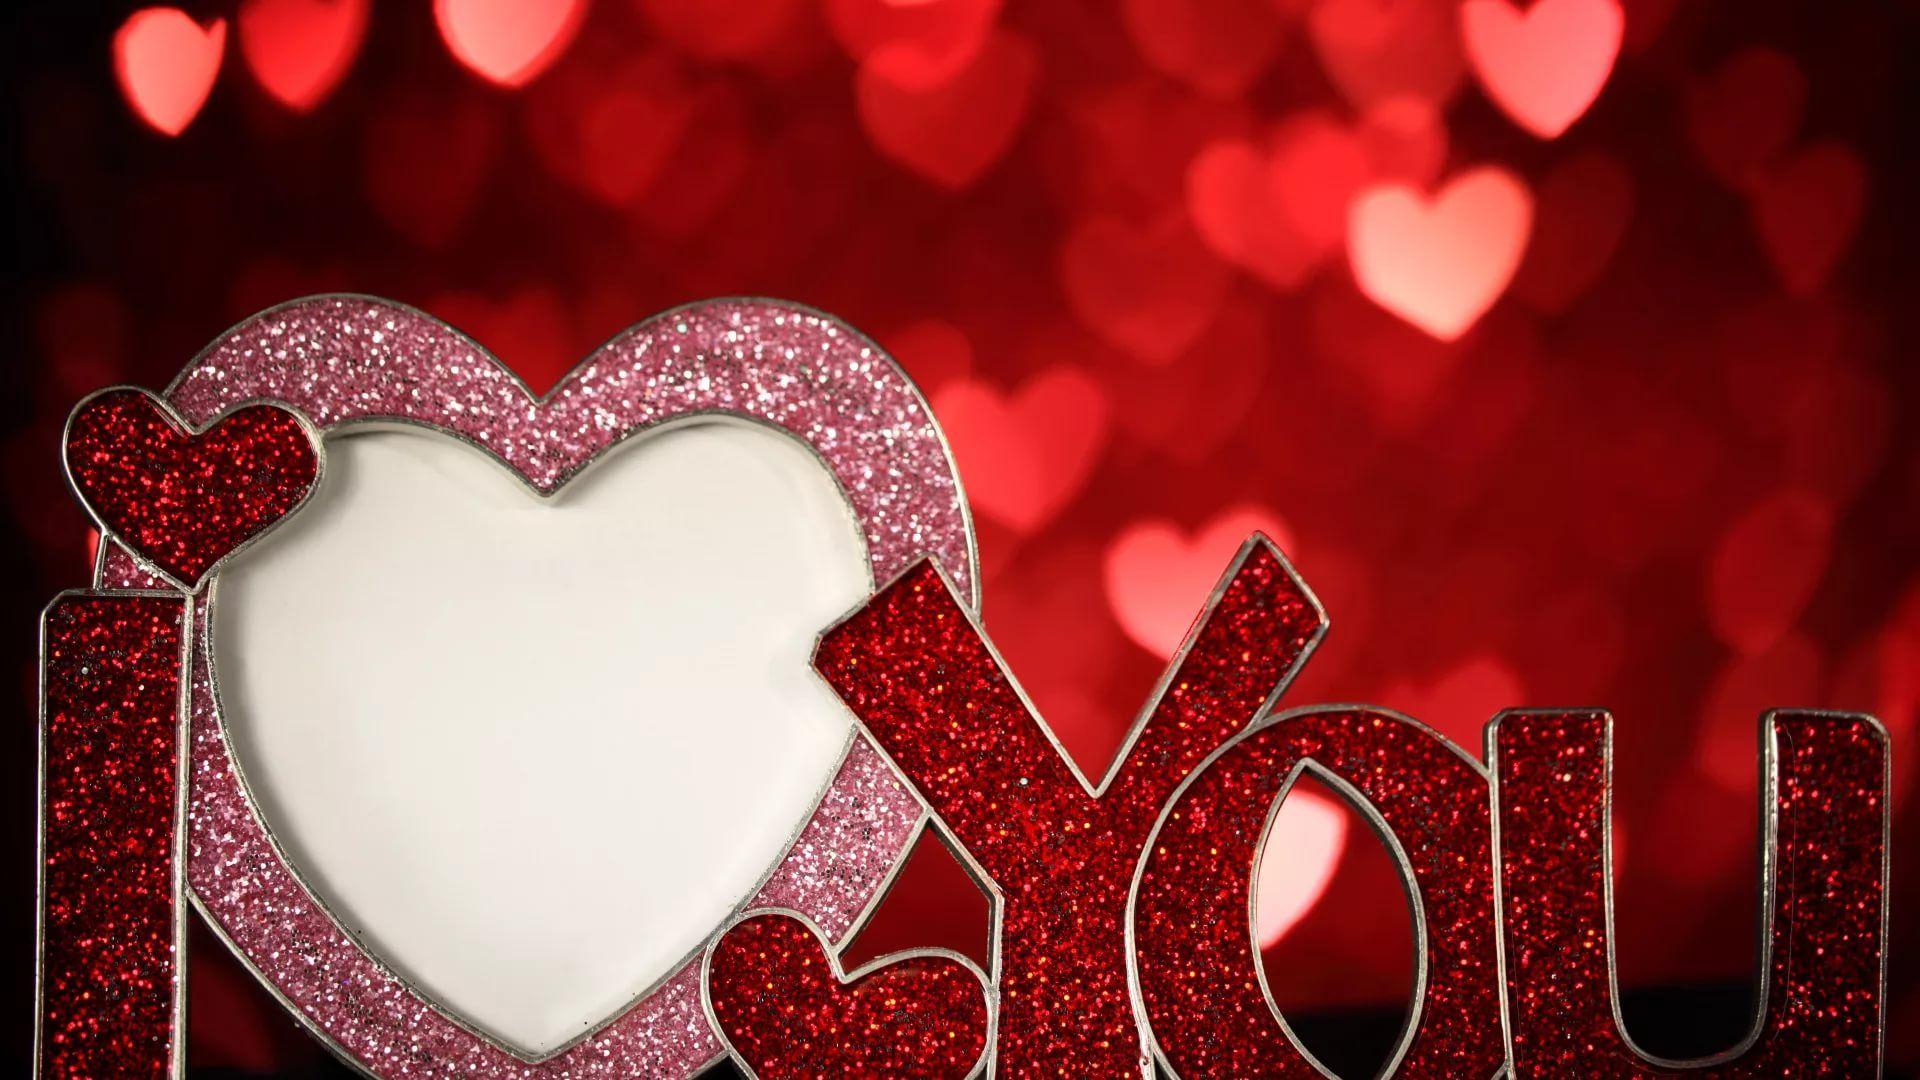 Valentine Screensaver Background Wallpaper HD